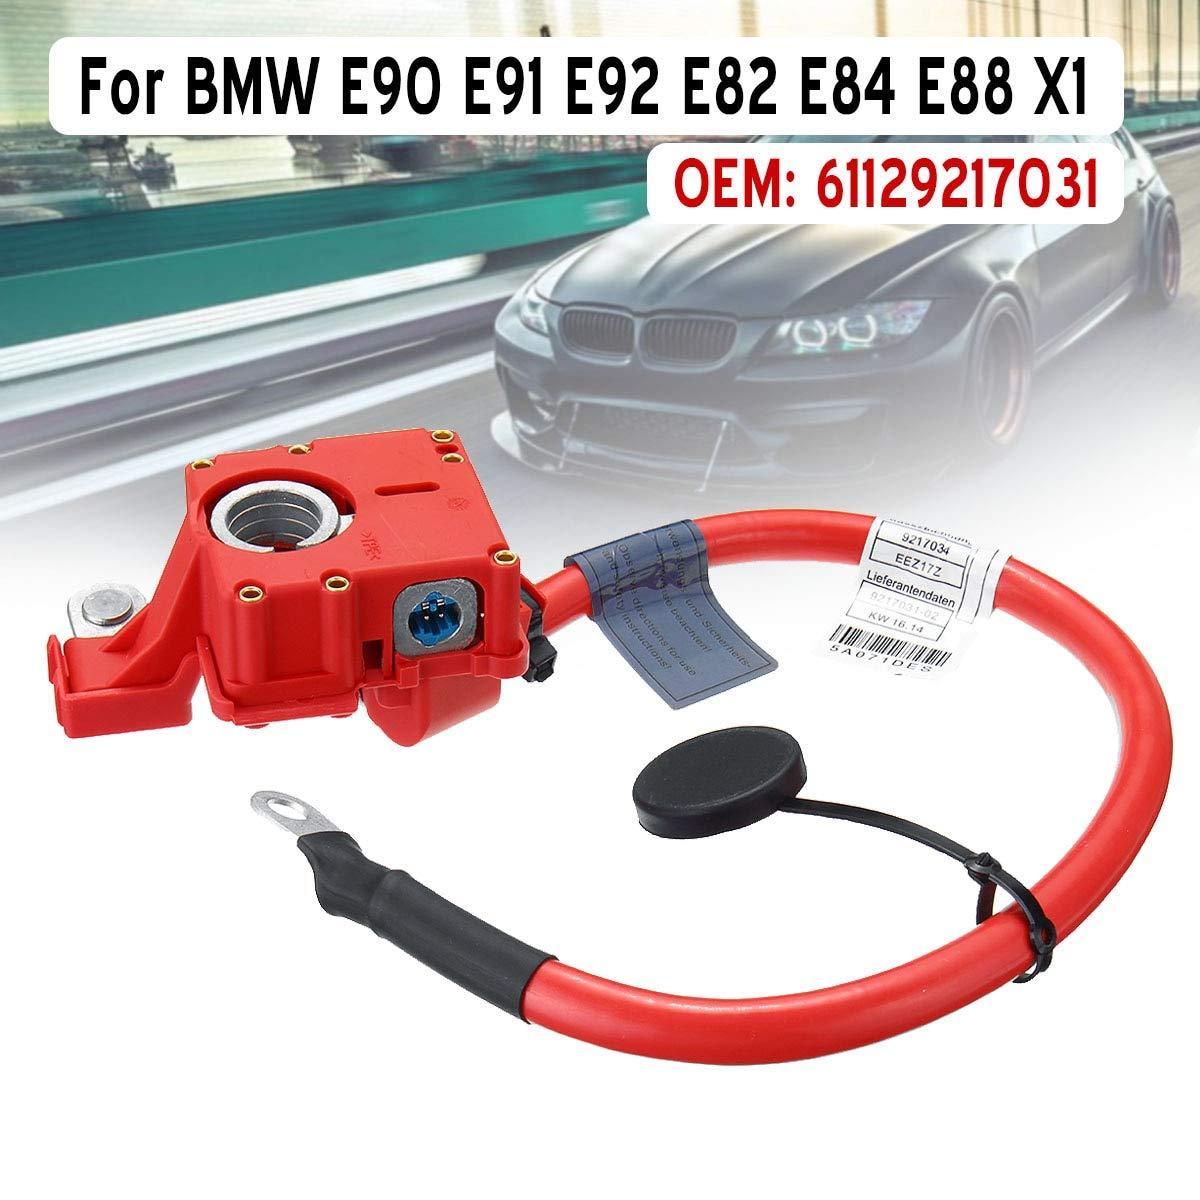 Car Battery Protector Wire Cable Line 61129217031 Positive Terminal to Battery Cable for BMW E90 E91 E92 E82 E84 E88 X1 by LA THI PHUONG